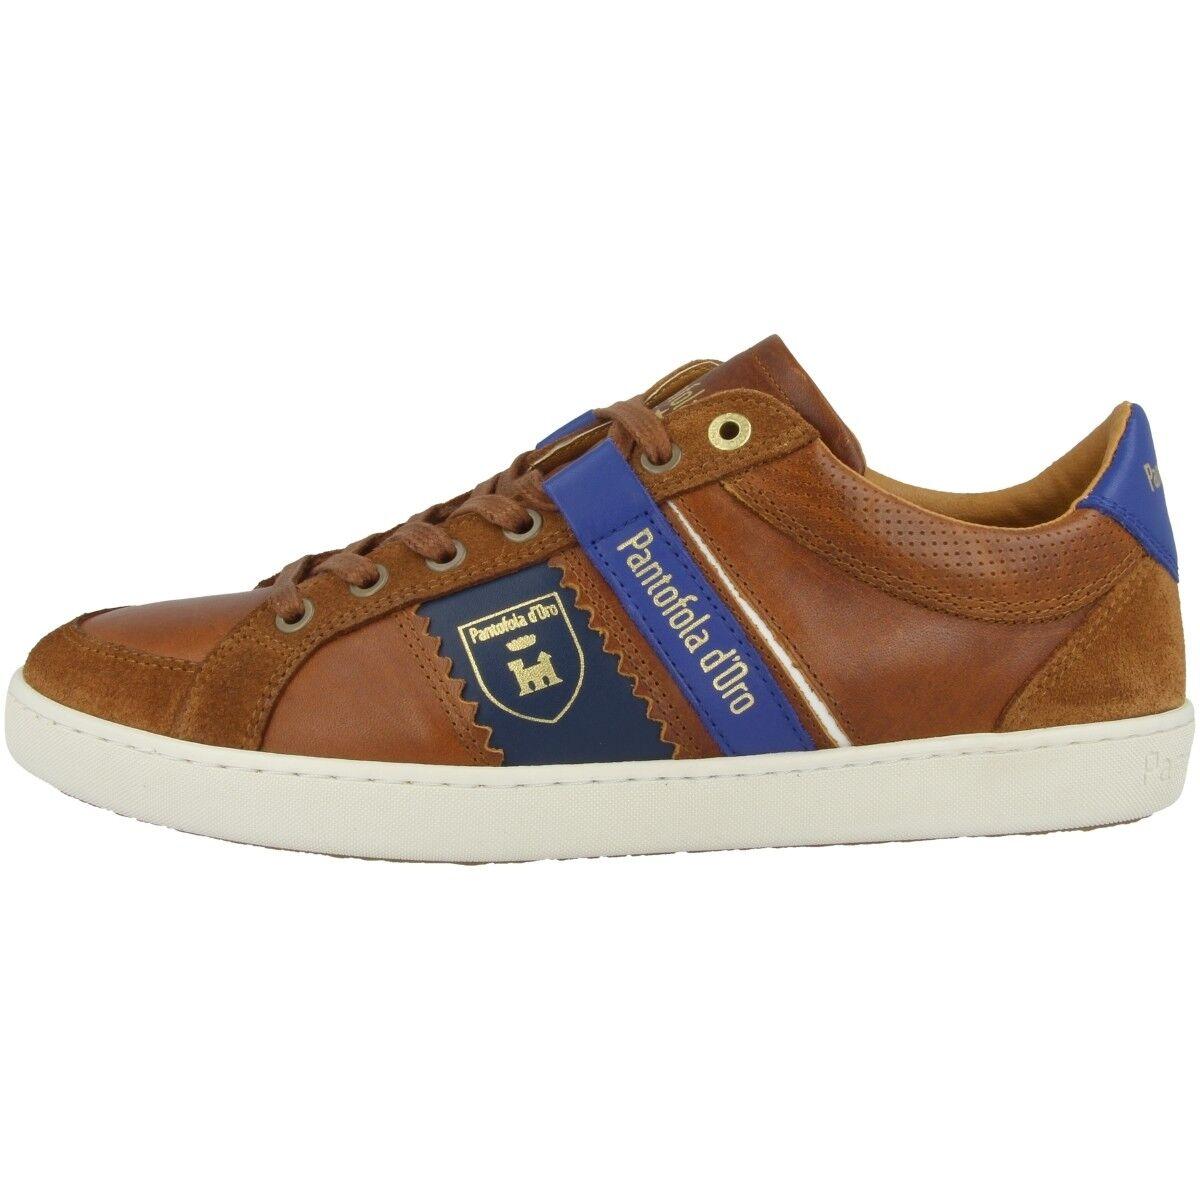 Pantofola D  oro Savio UOMO Low Pesaro Piceno scarpe Trainers Shell 10191040.jcu  stile classico